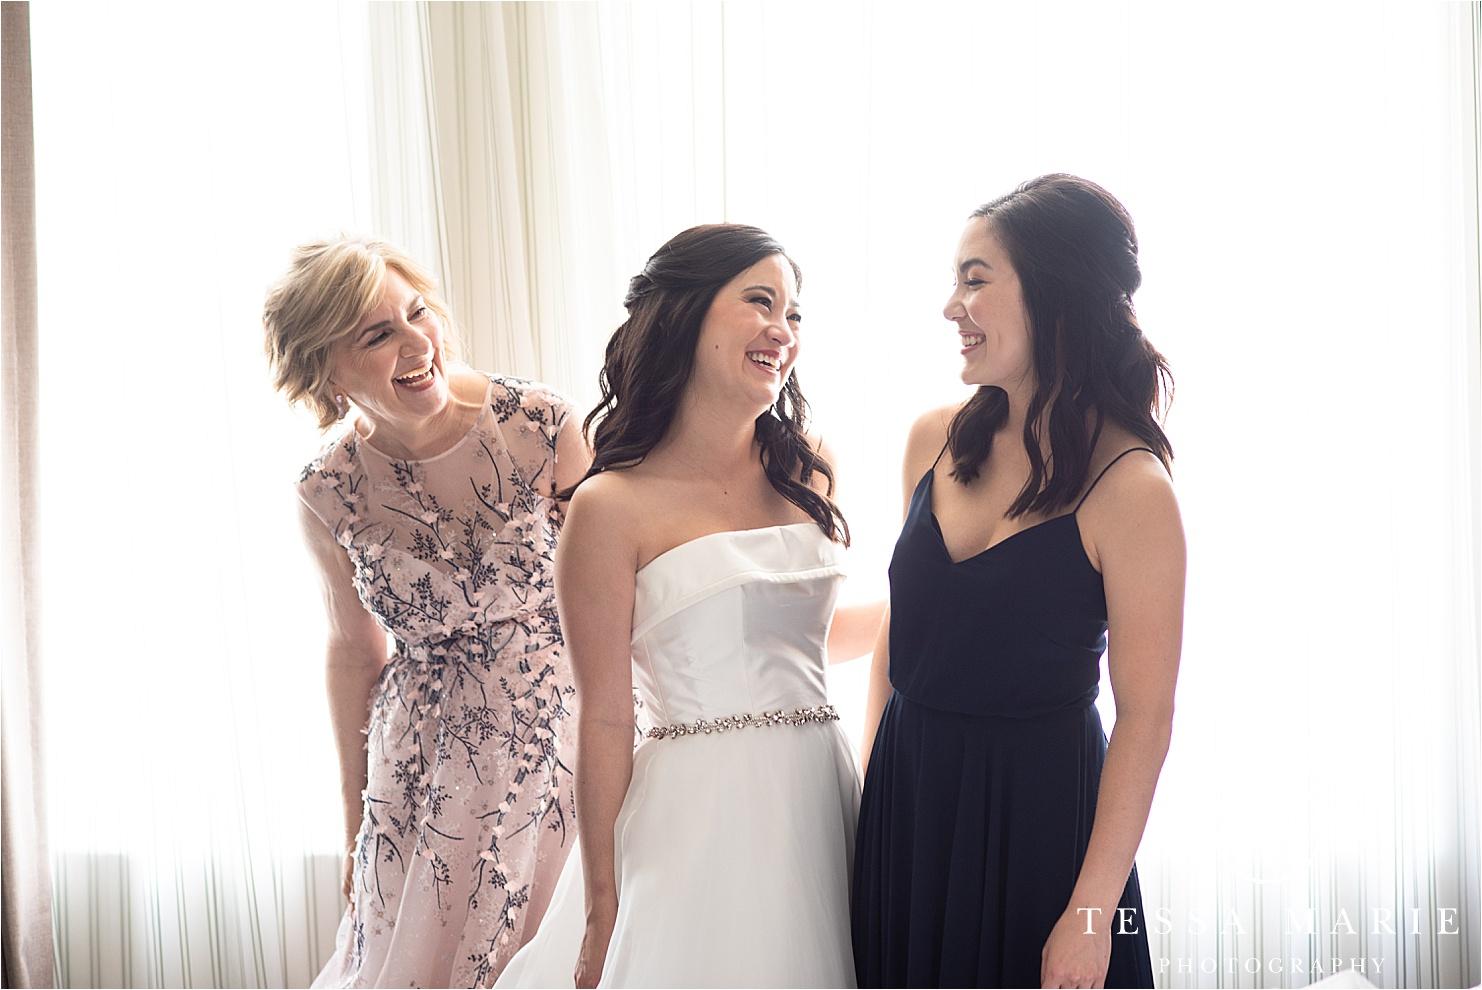 Tessa_marie_weddings_houston_wedding_photographer_The_astorian_0019.jpg